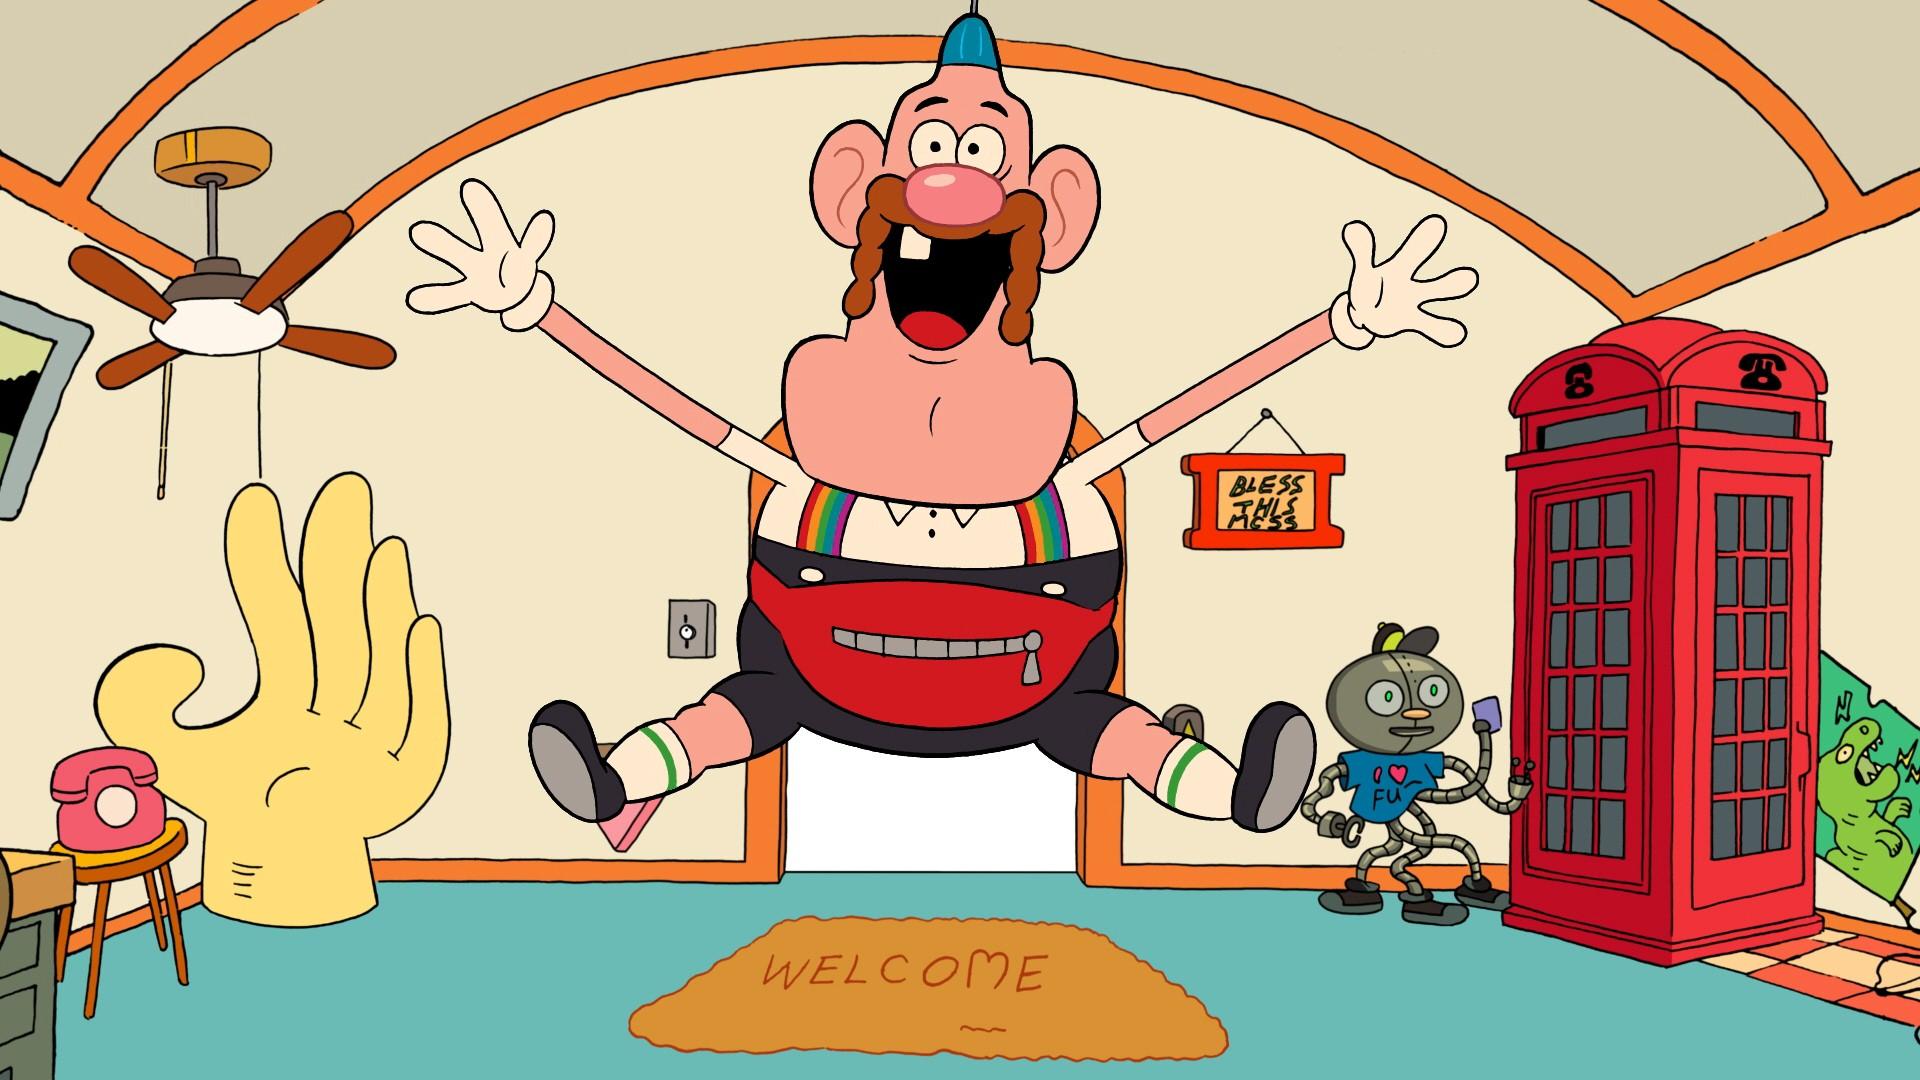 Quot Wujcio Dobra Rada Quot Nowa Kresk 243 Wka Cartoon Network Wideo Cartoon Network Media2 Pl